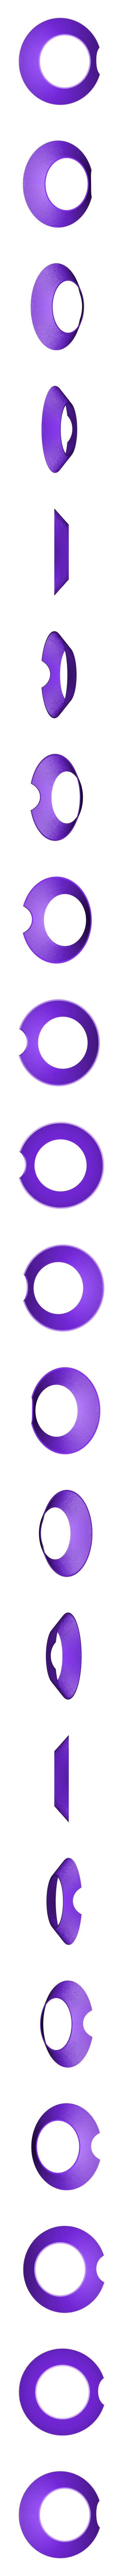 roof_lev4.stl Download free STL file The Crannog • 3D printable template, Earsling